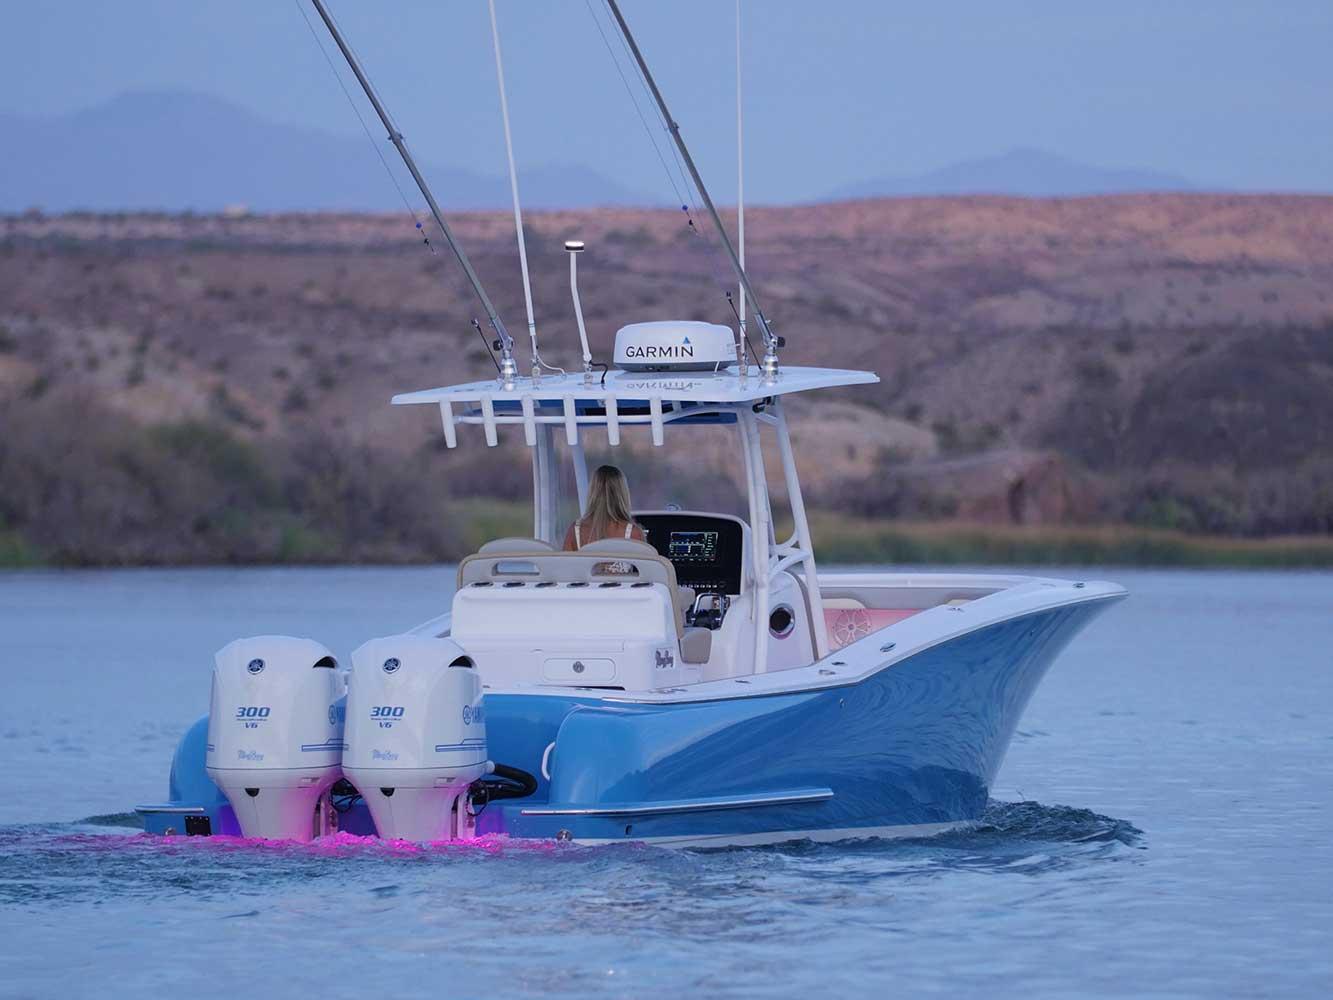 Yacht-behind-image.jpg